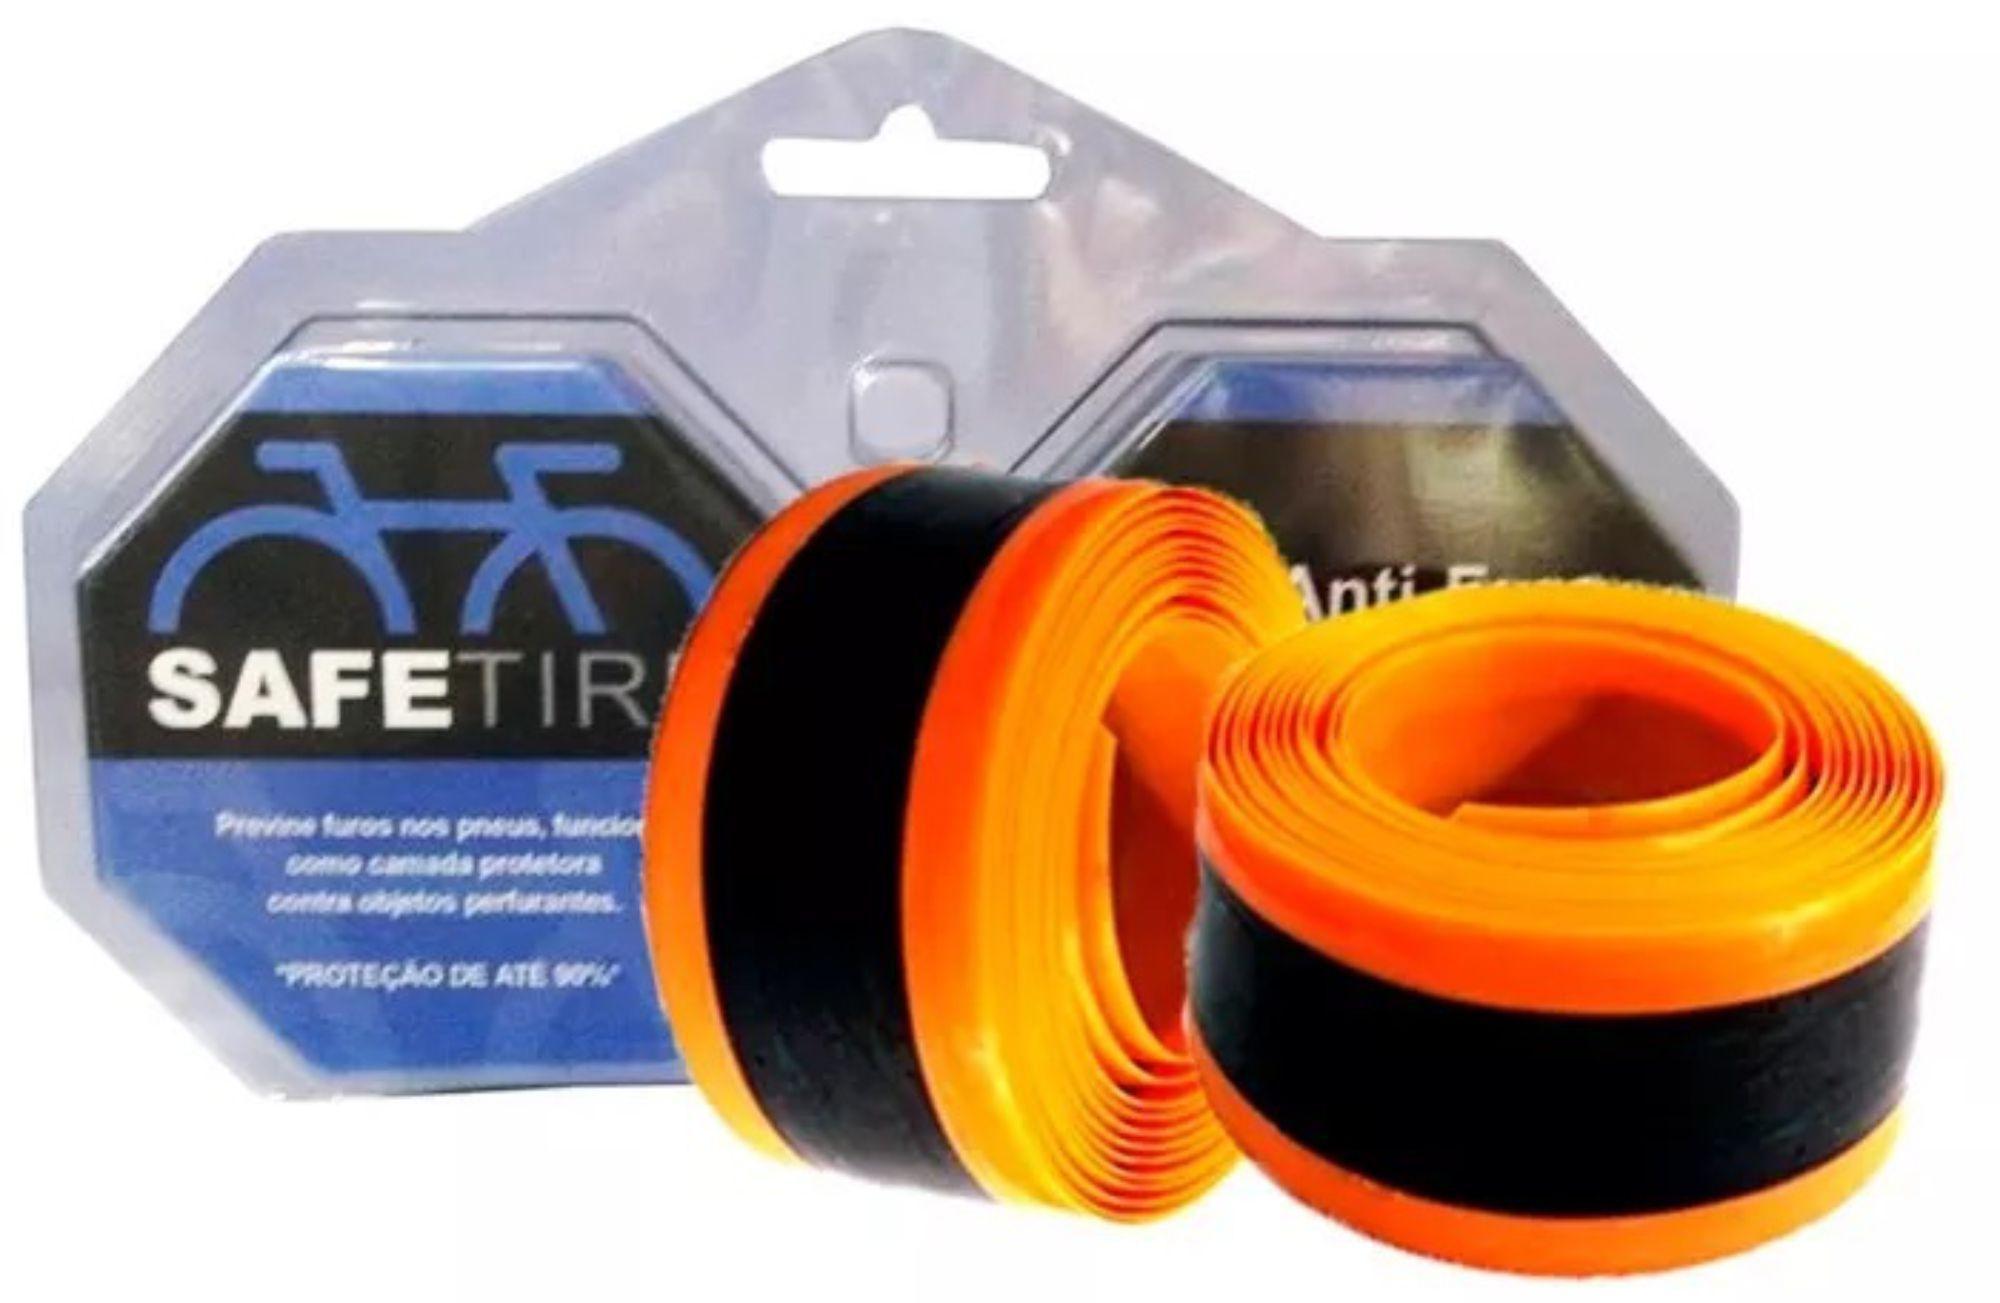 FITA ANTI FURO SAFE TIRE 23mm PAR-27/700